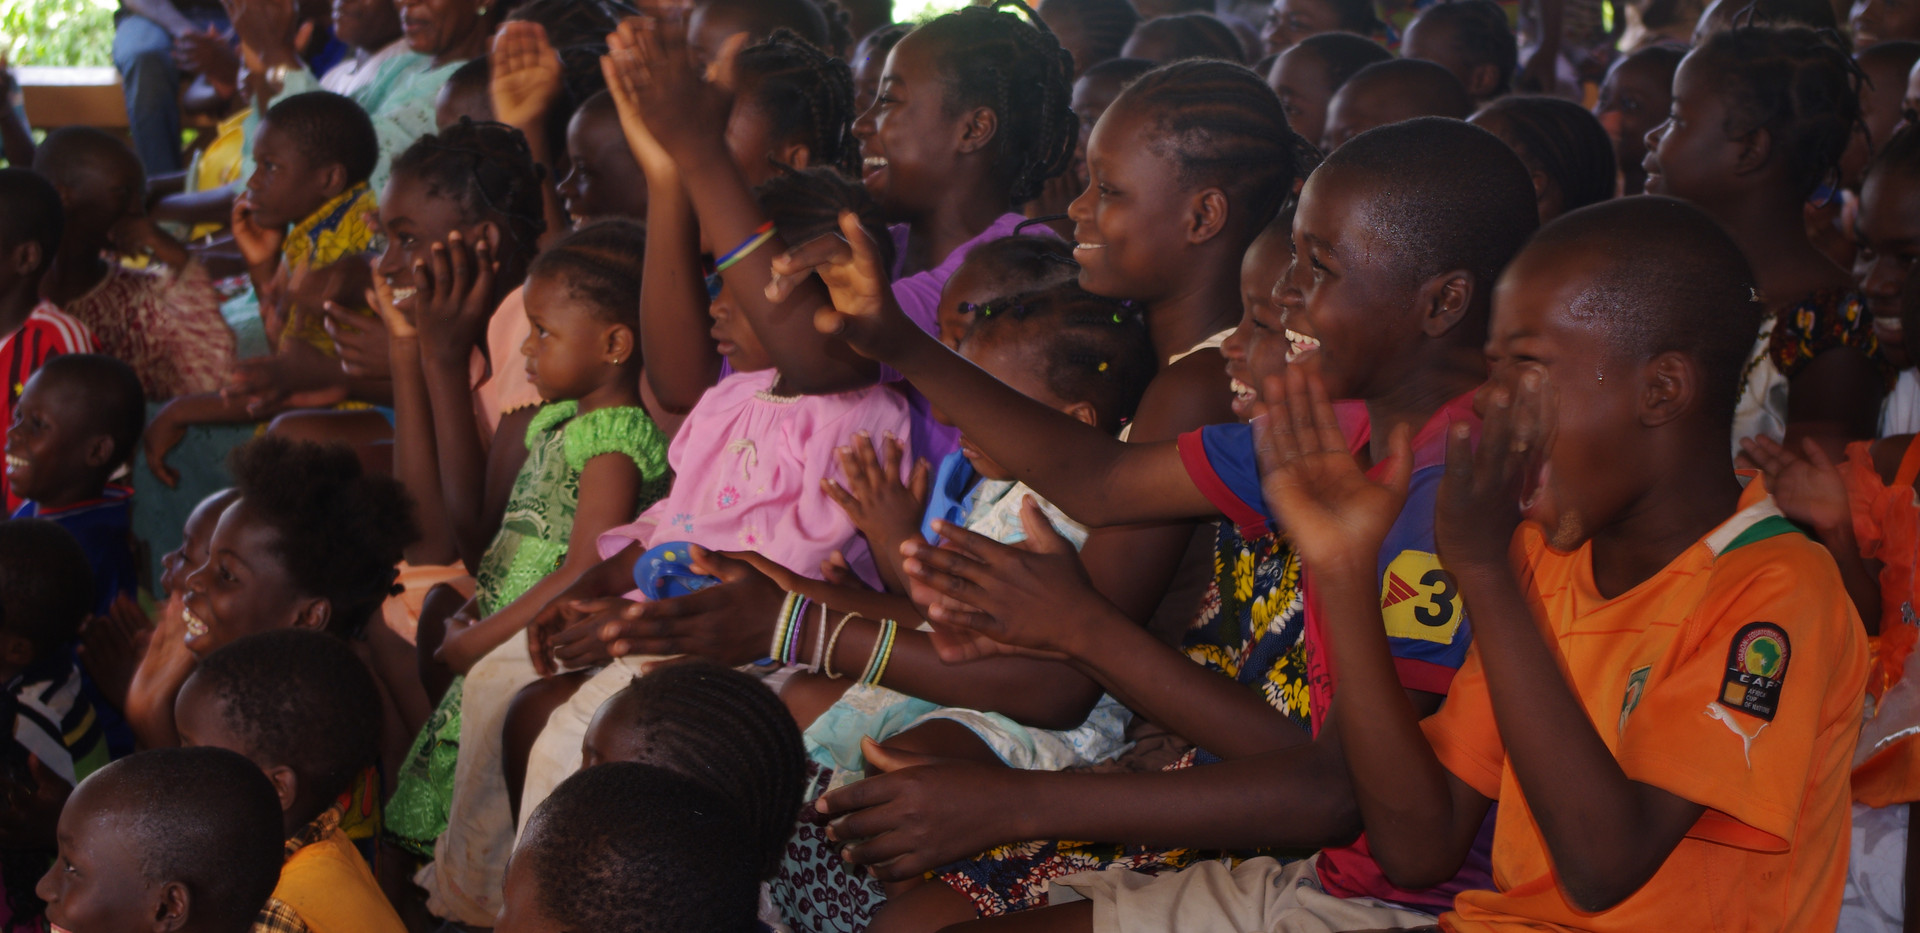 Burkina2014_03.JPG